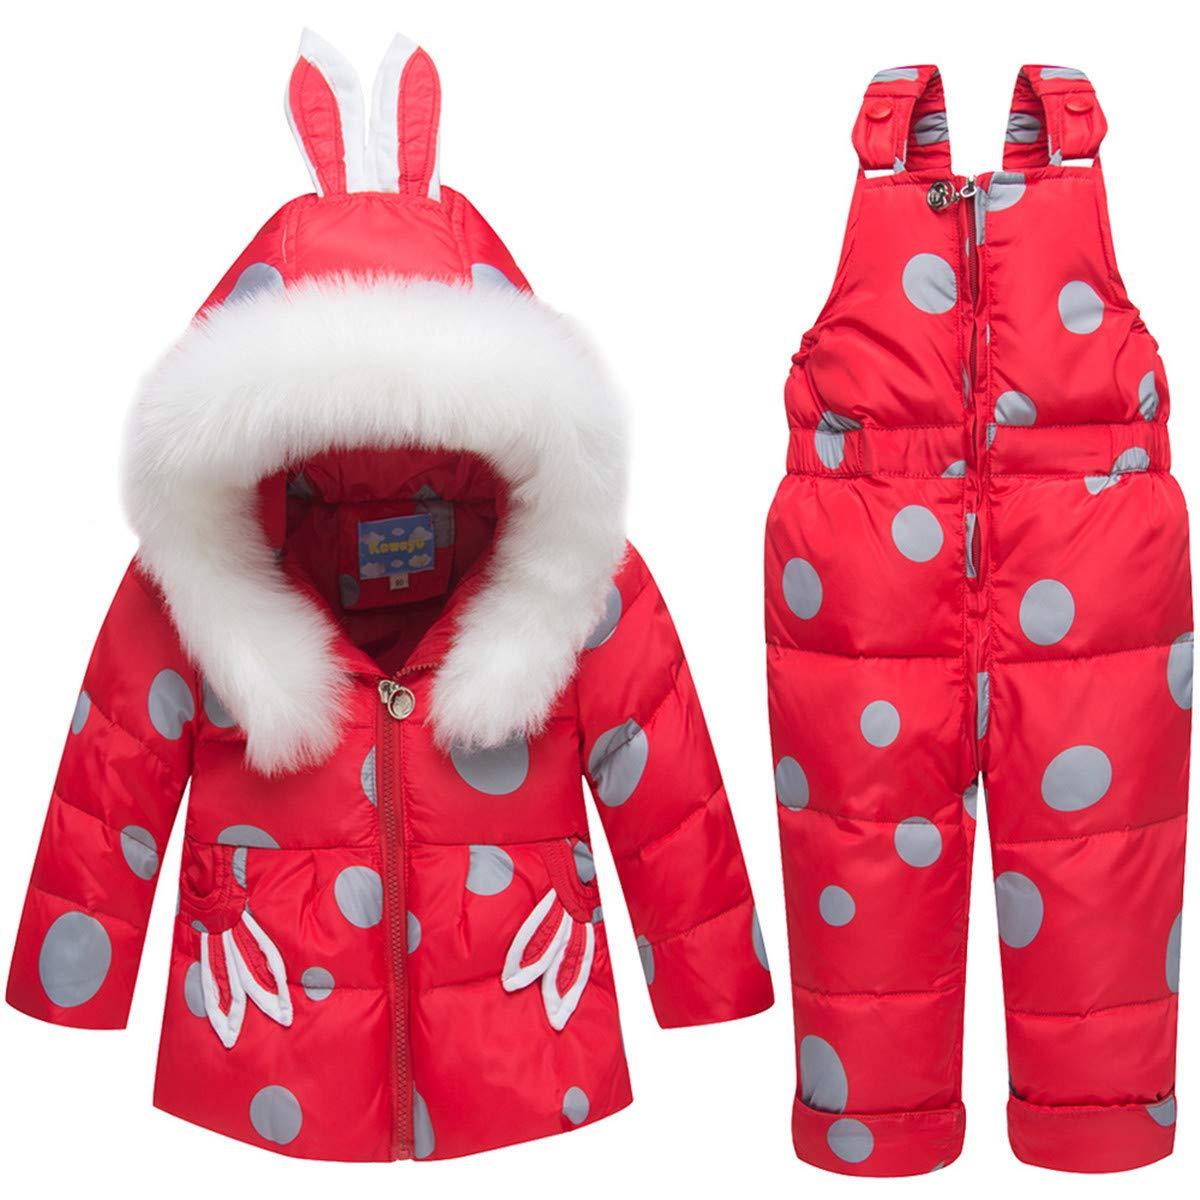 REWANGOING Baby Kids Girls Boys Winter Warm Fur Trim Zipper Soild Hooded Puffer Down Jacket Snowsuit with Ski Bib Pants Set